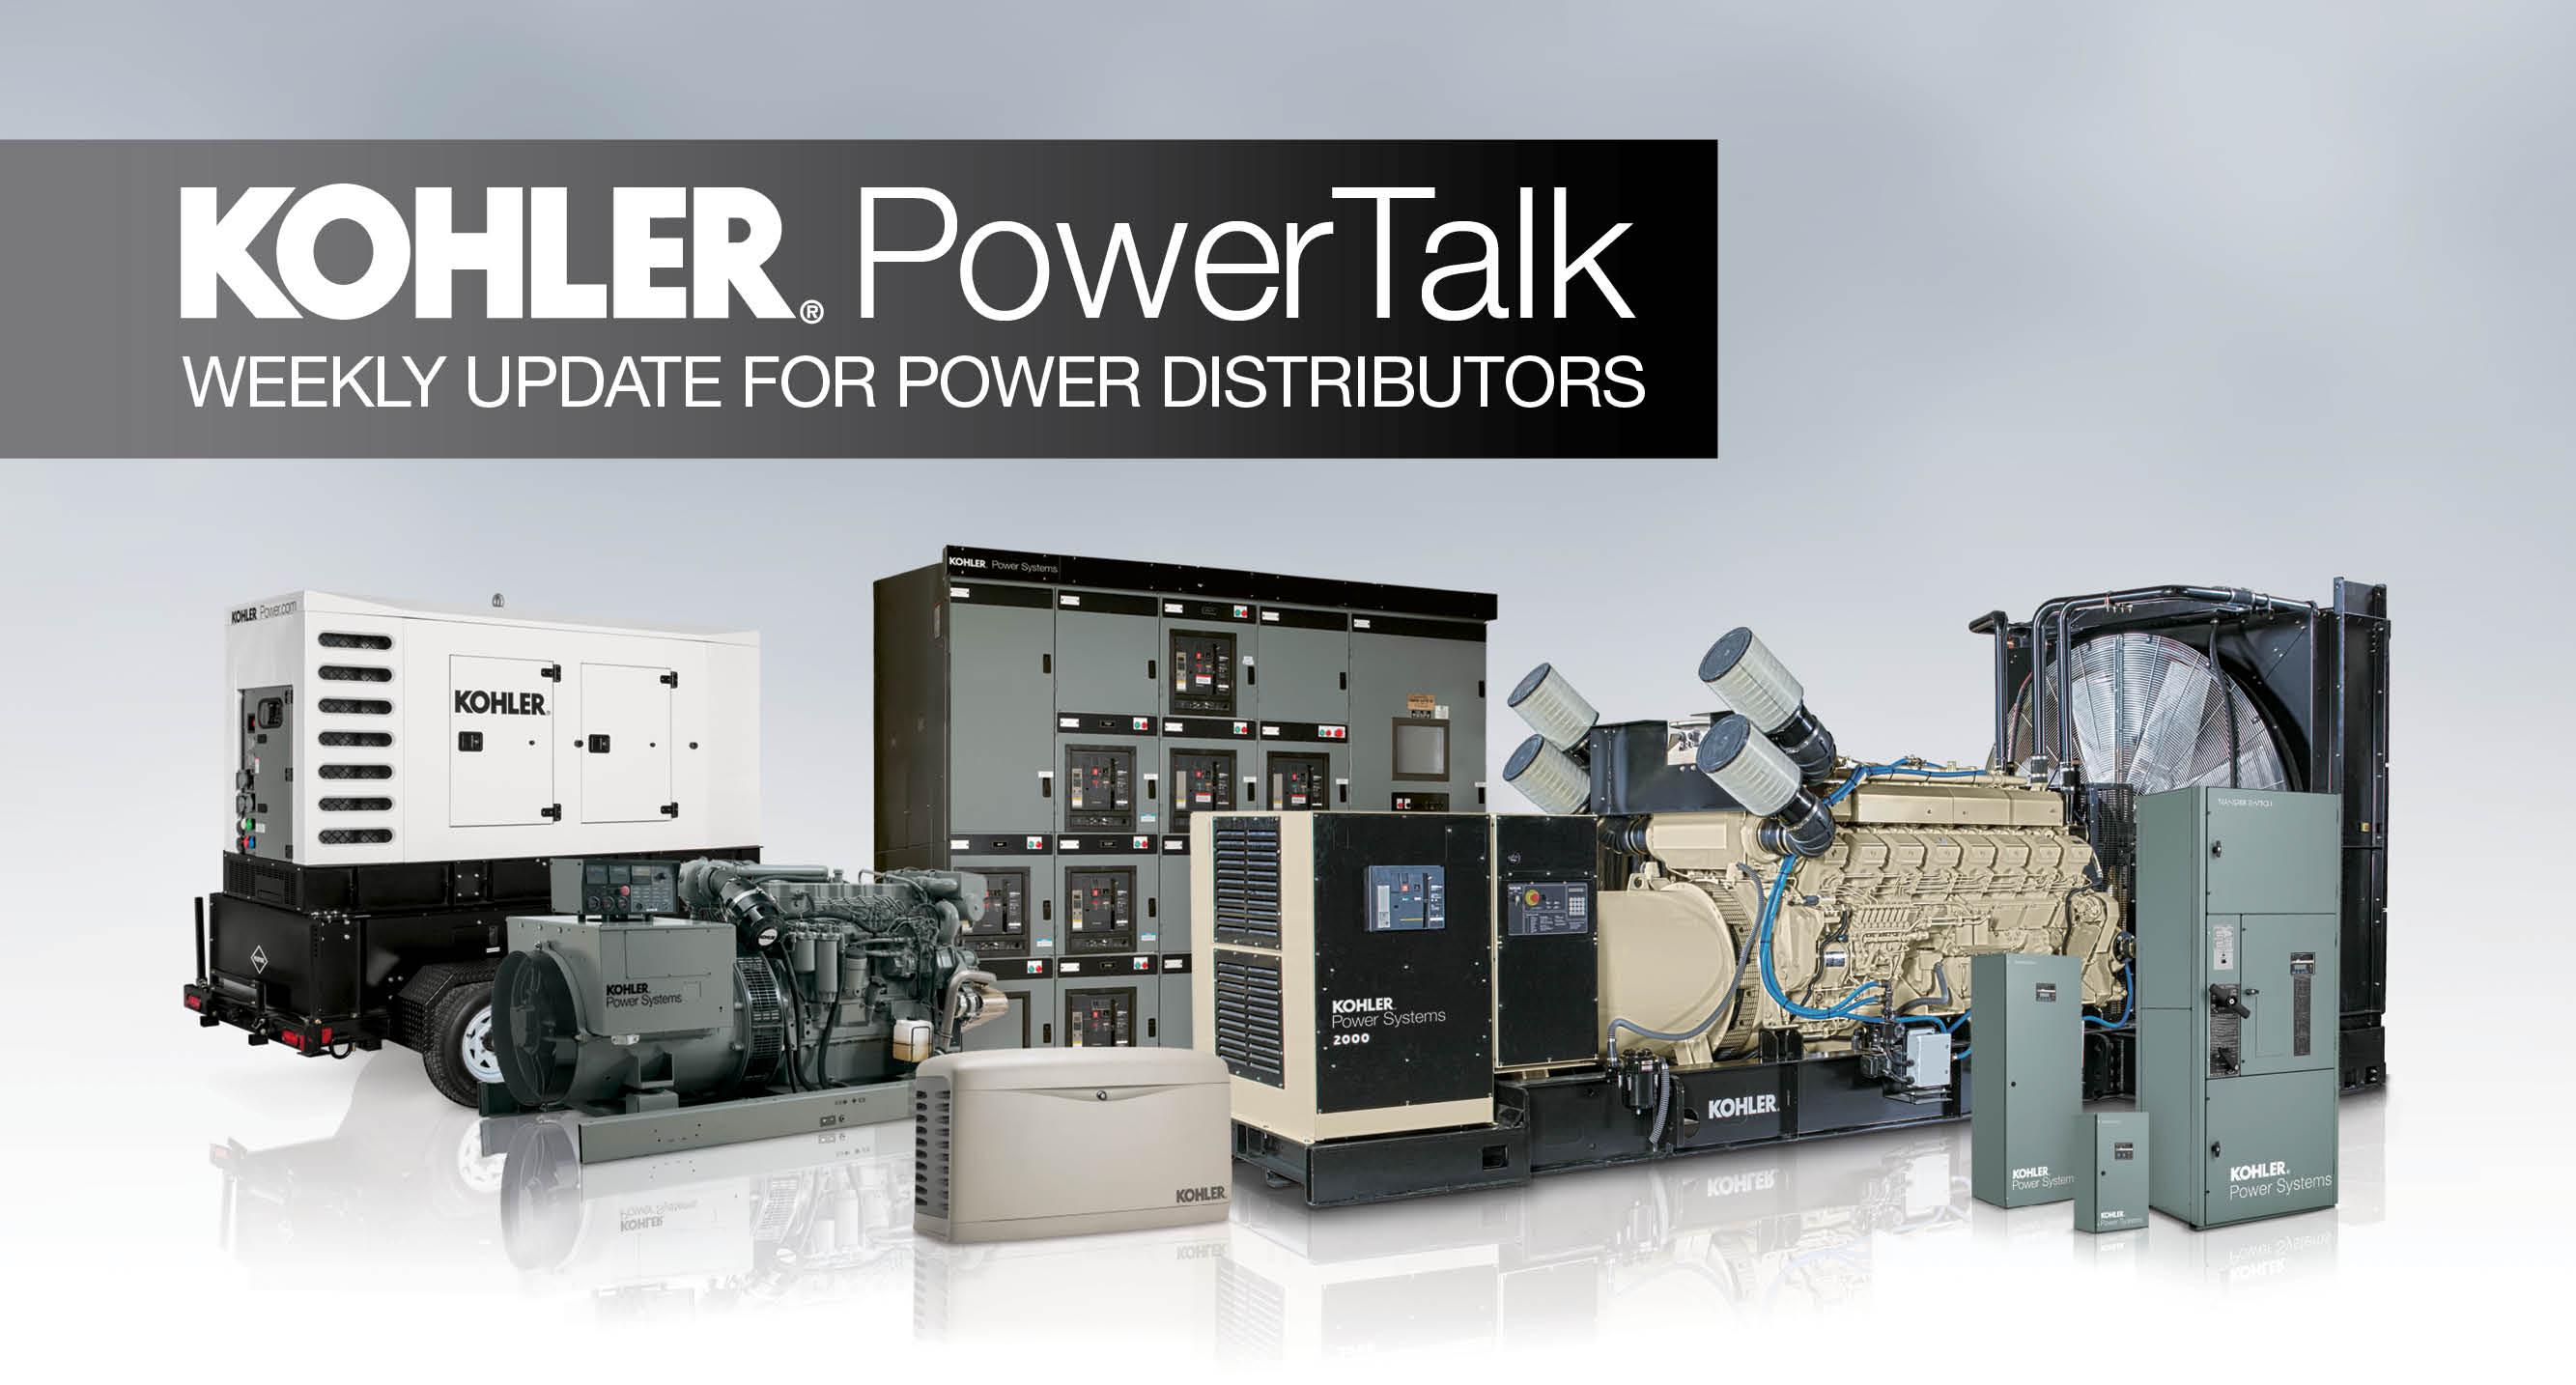 Powertalk: Weekly Update for Power Distributors